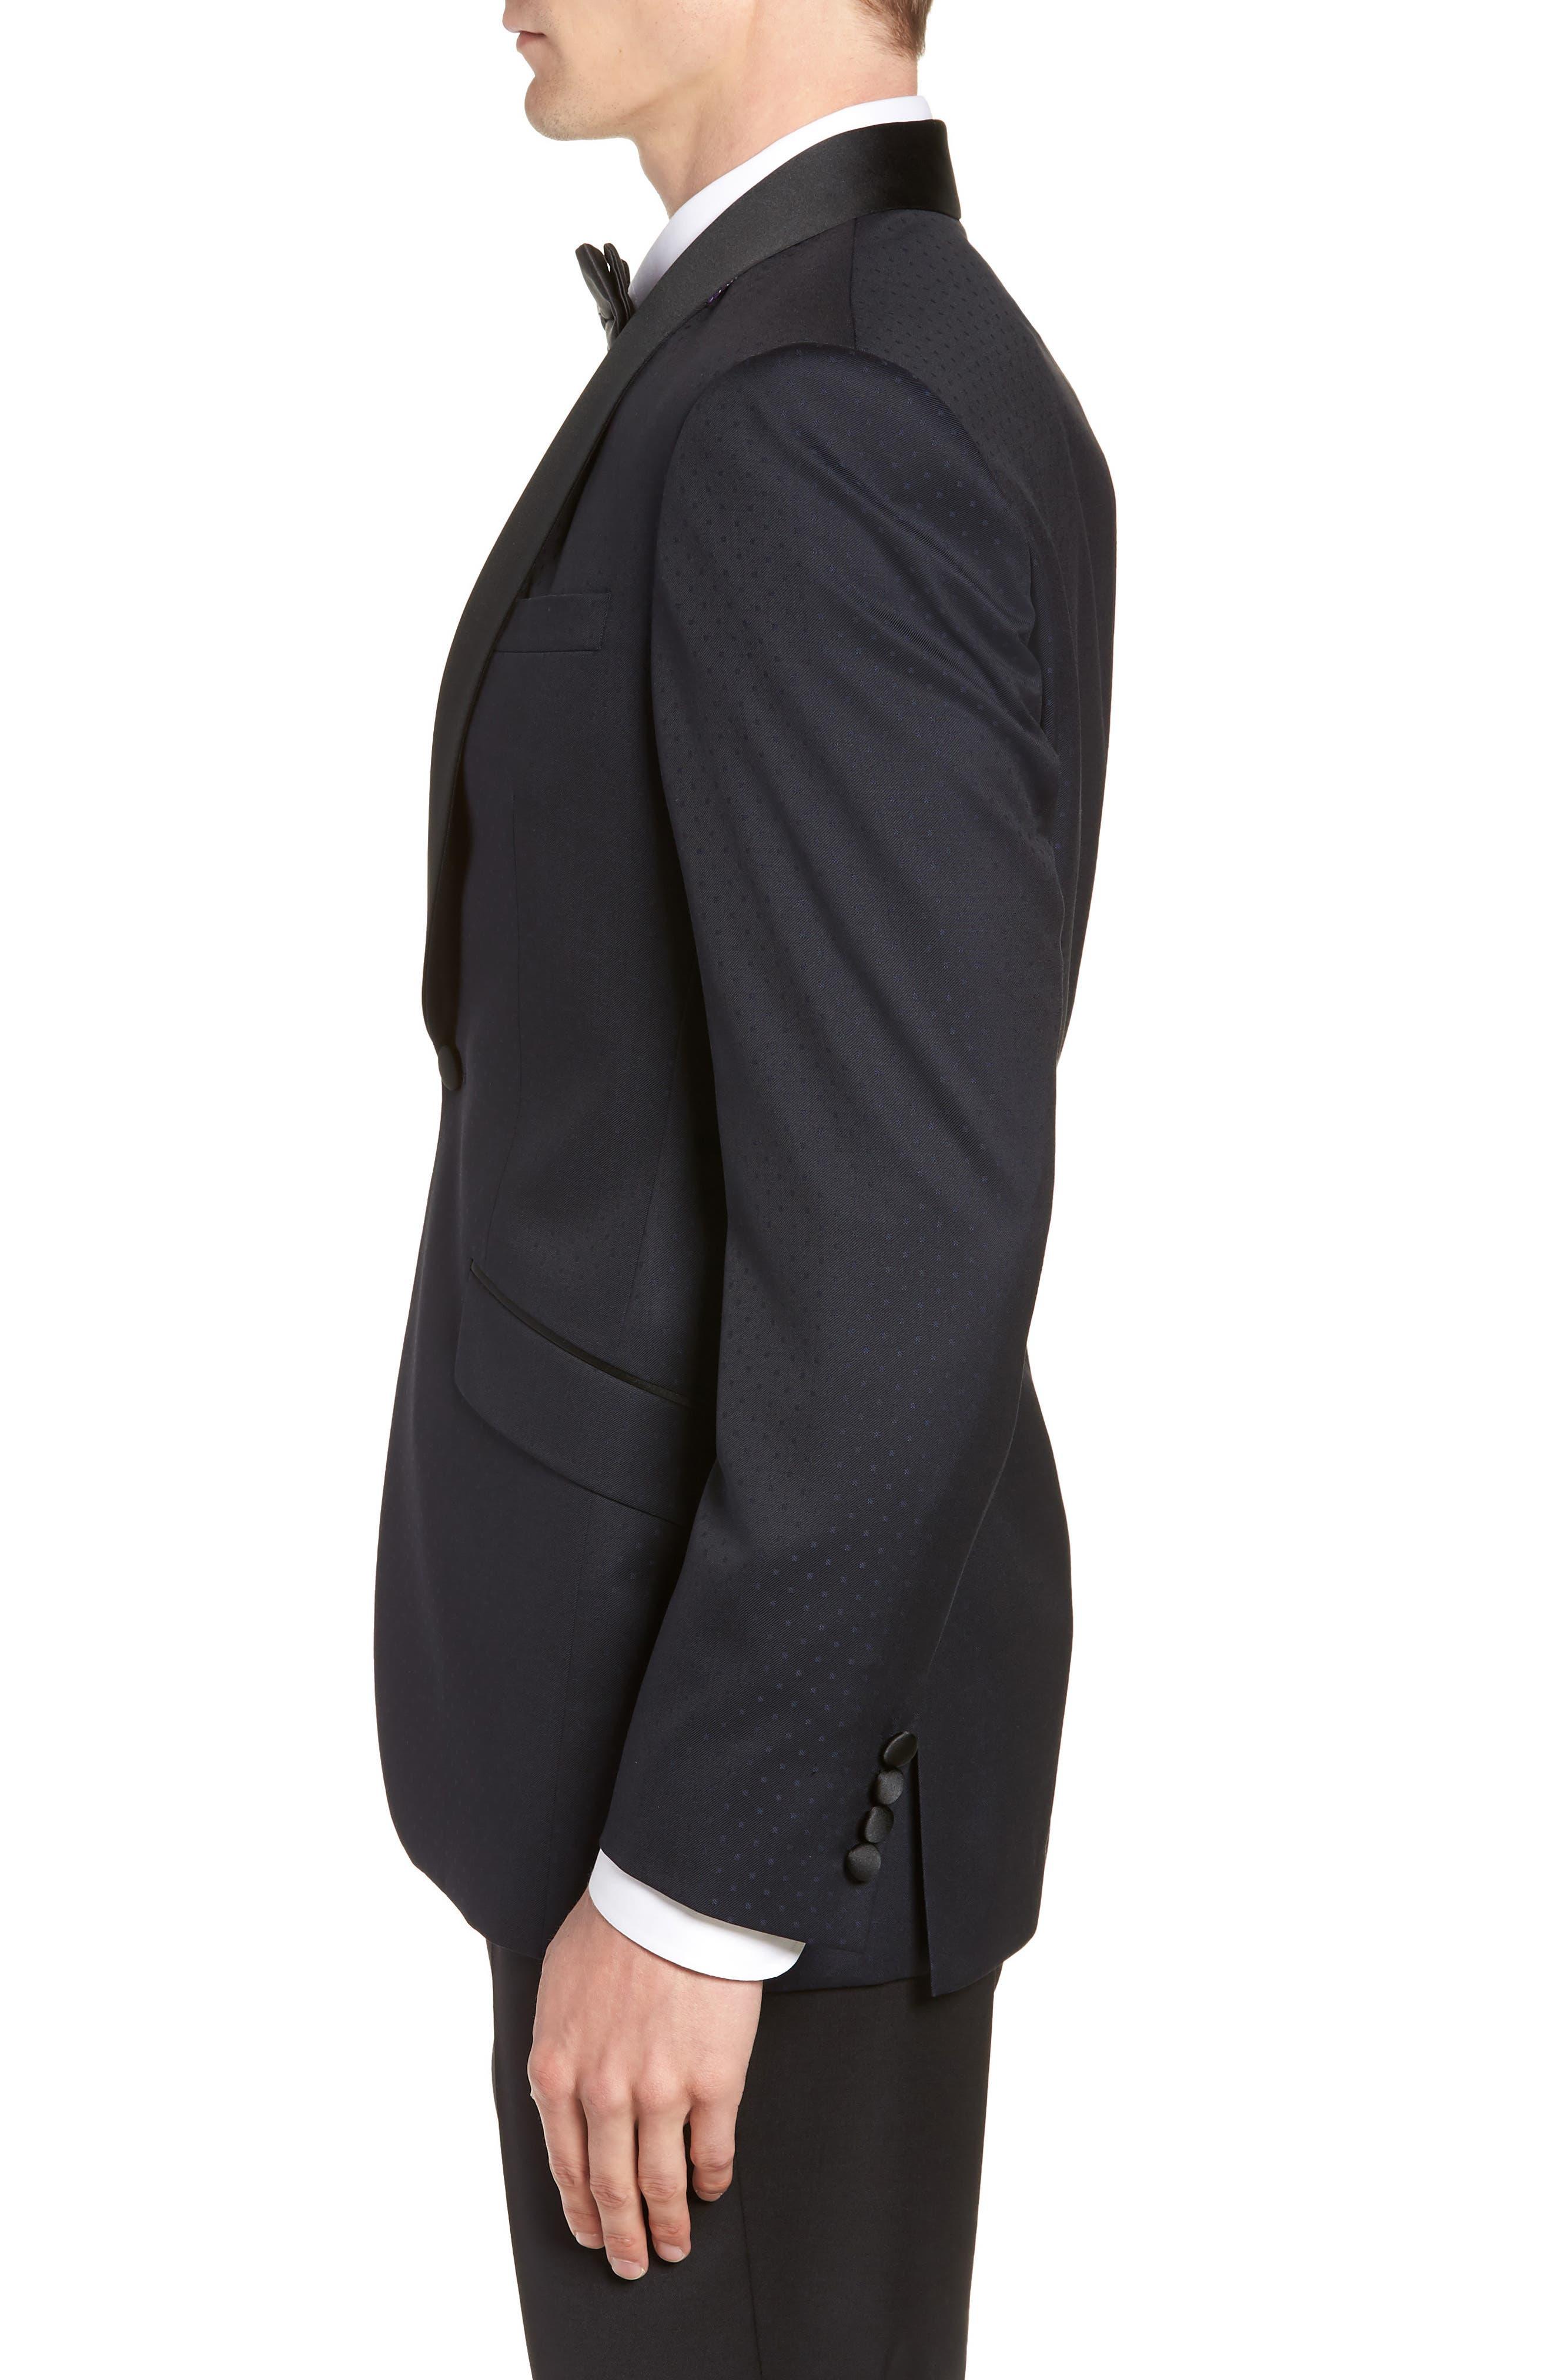 Josh Trim Fit Shawl Collar Wool Dinner Jacket,                             Alternate thumbnail 3, color,                             NAVY